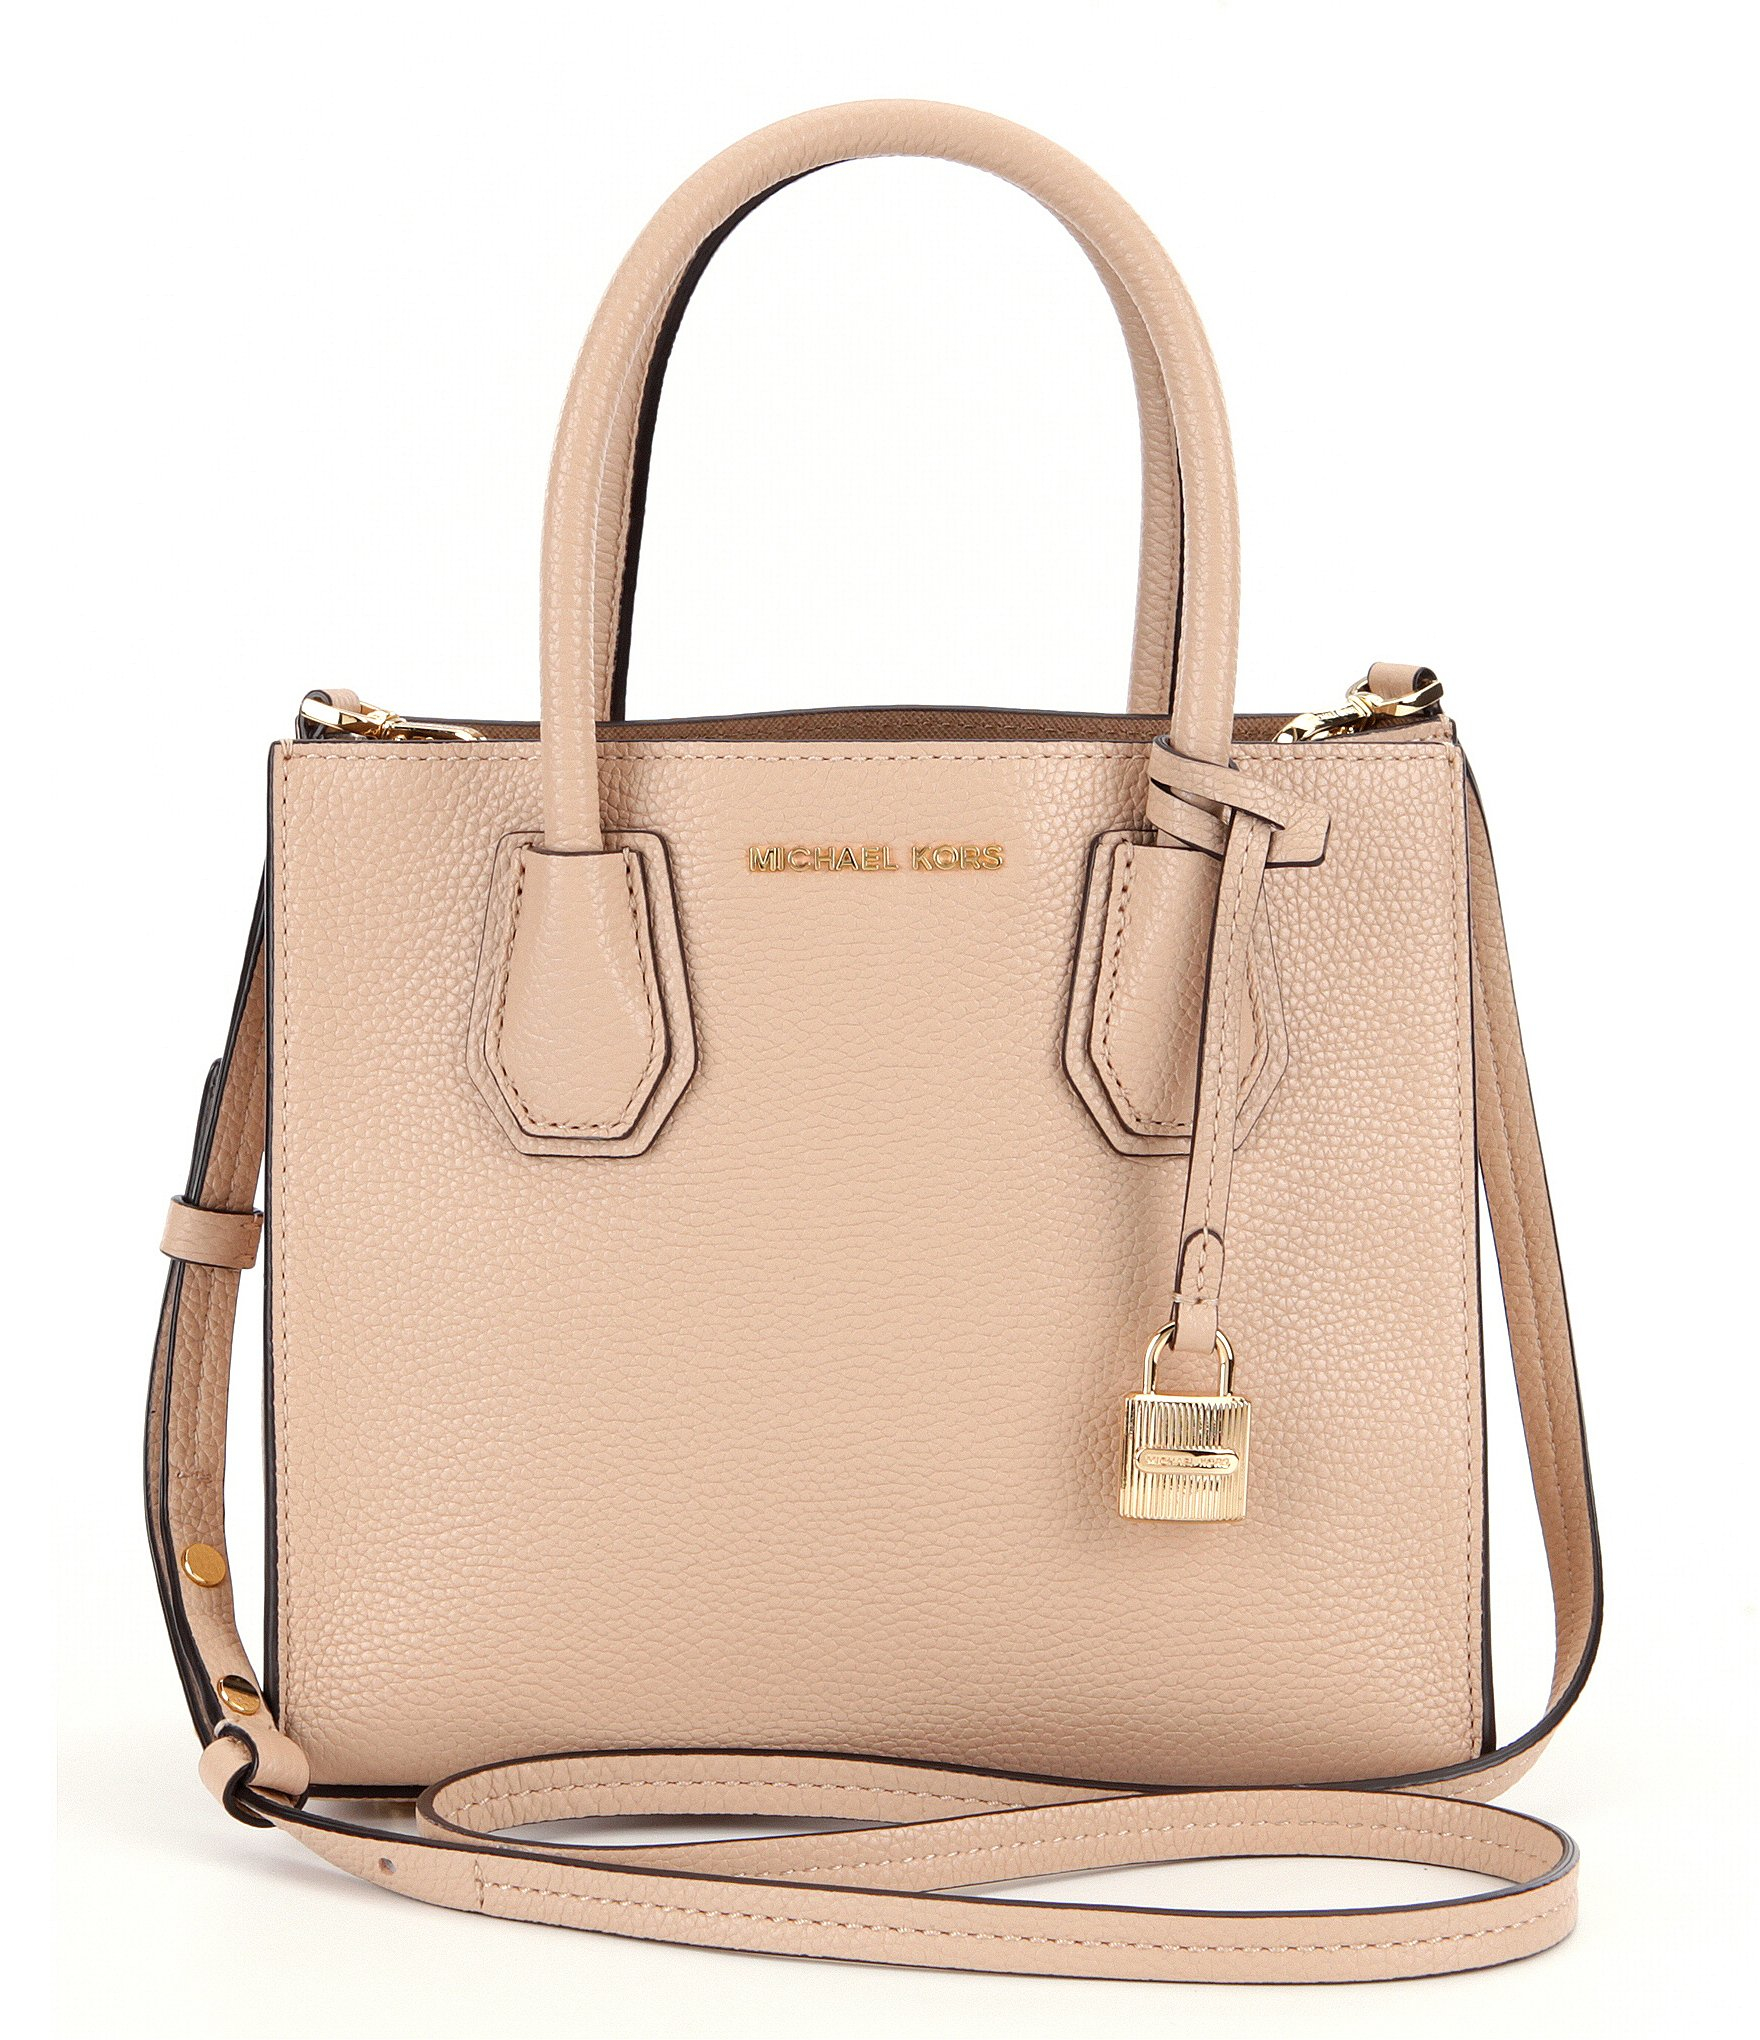 MICHAEL Michael Kors Studio Mercer Medium Messenger Bag in Natural ... 71709f22d7aa5